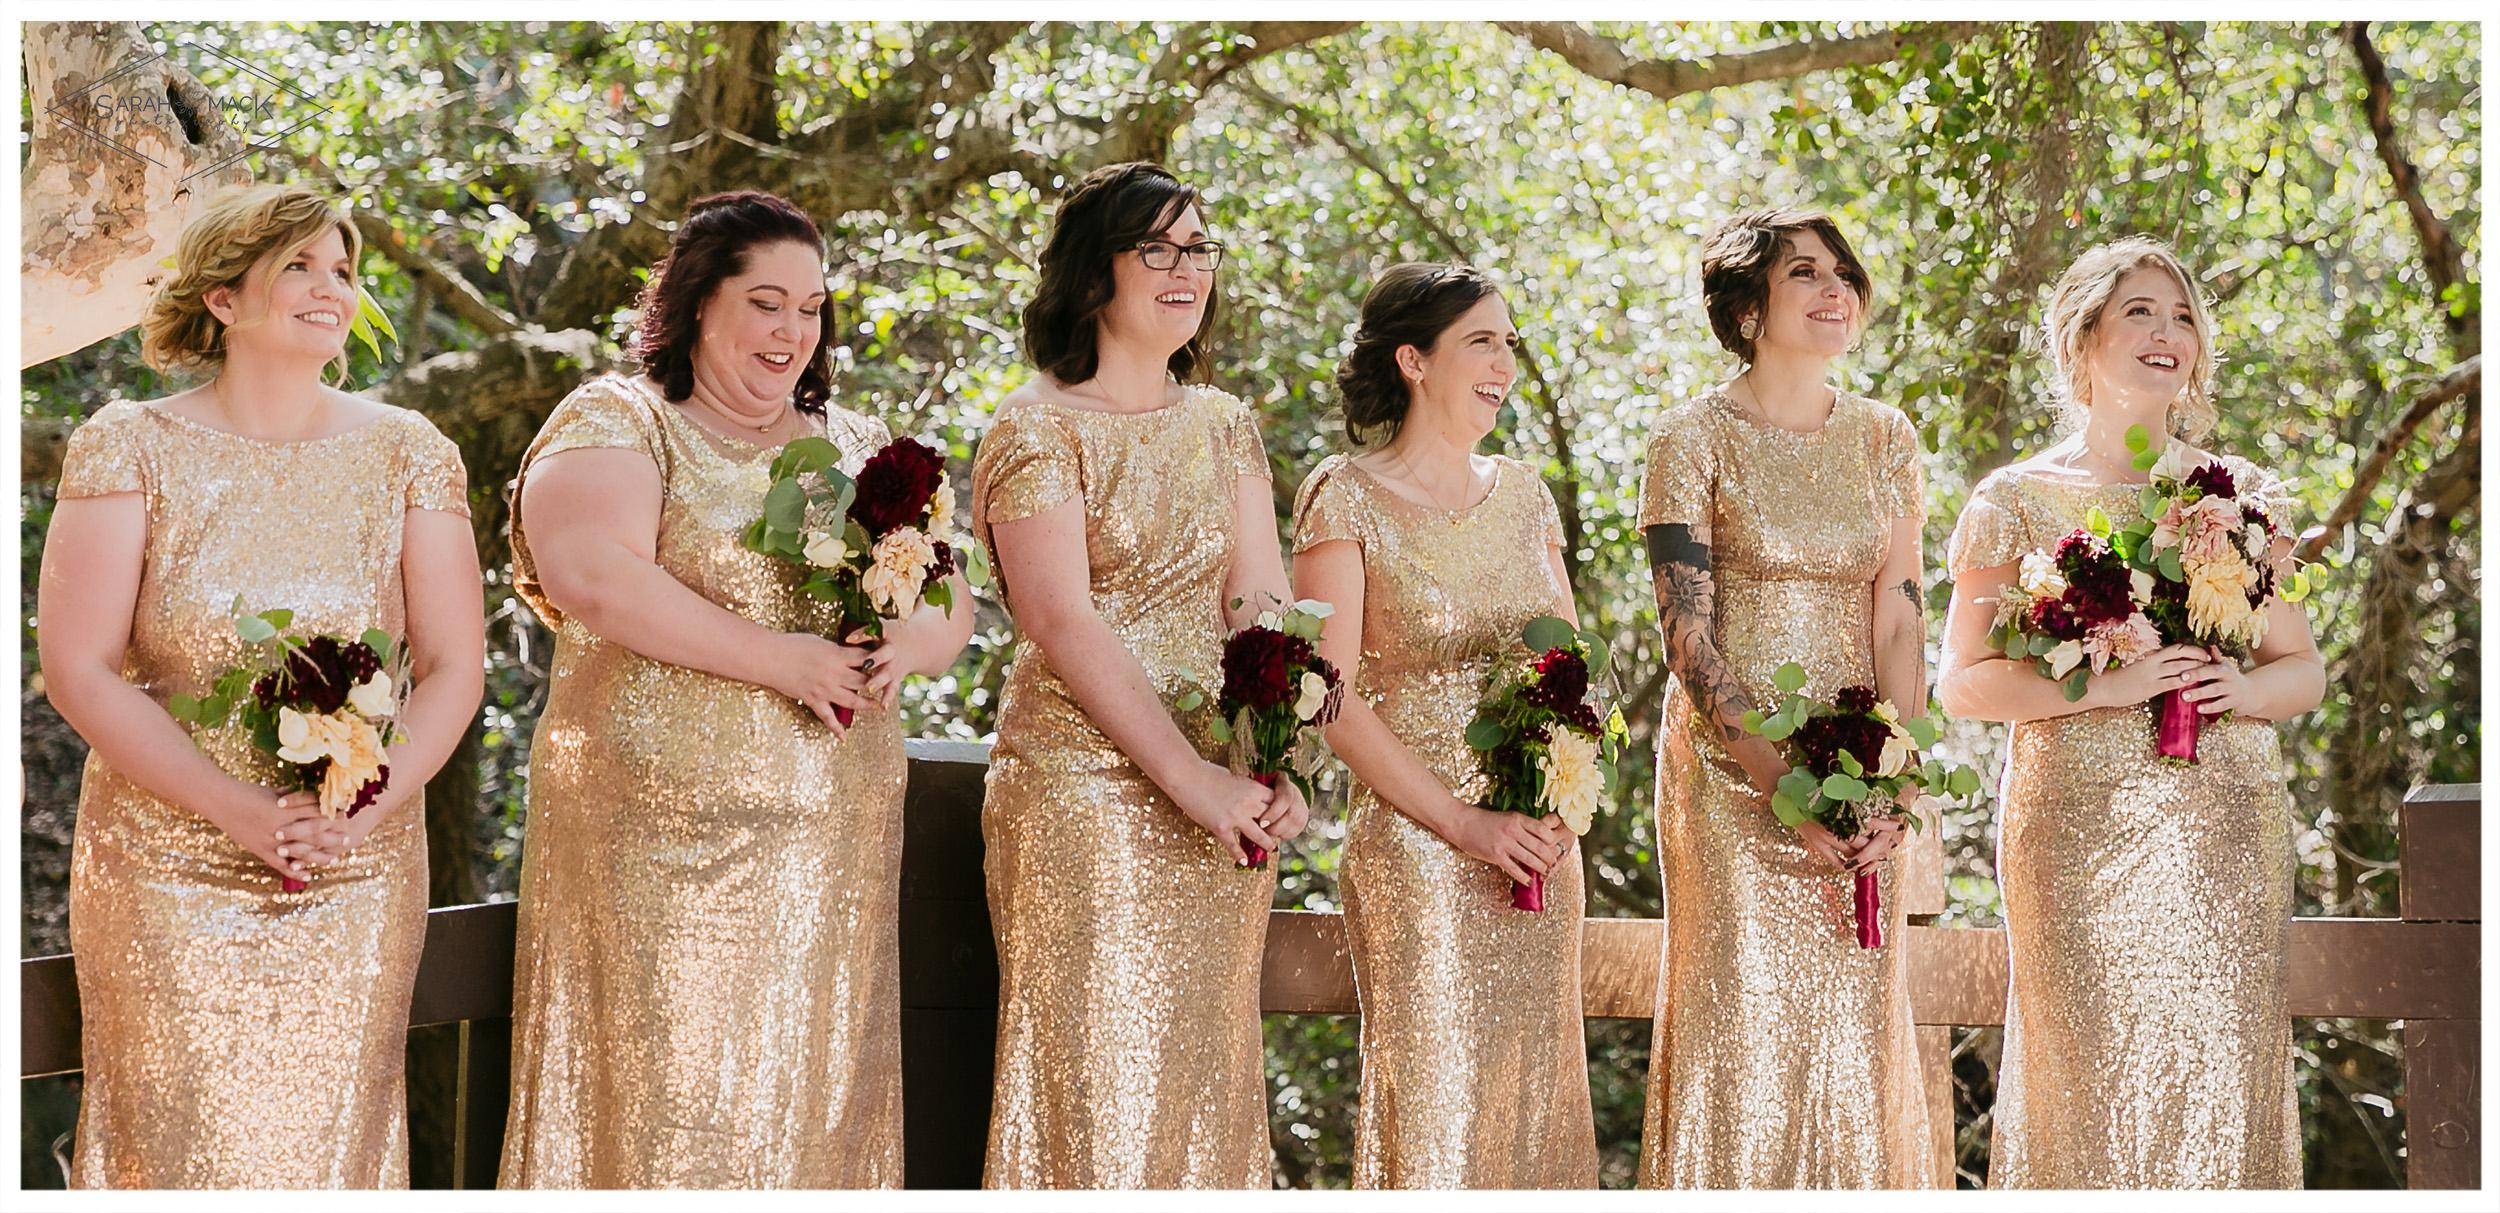 RF-Estate-on-Second-Santa-Ana-Wedding-Photography-34.jpg